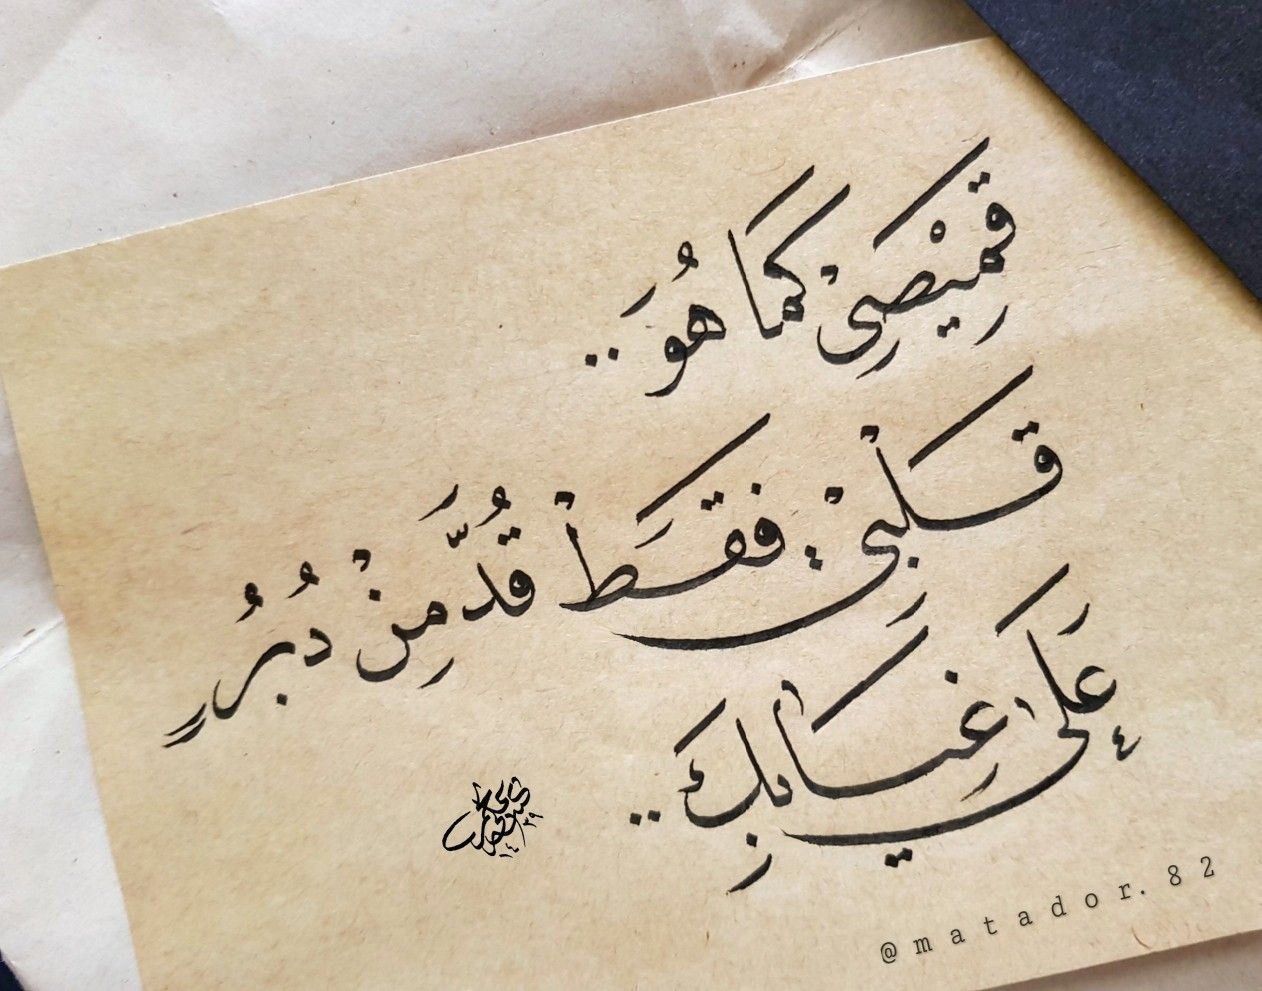 قلبي عليك Funny Arabic Quotes Love Quotes Words Quotes